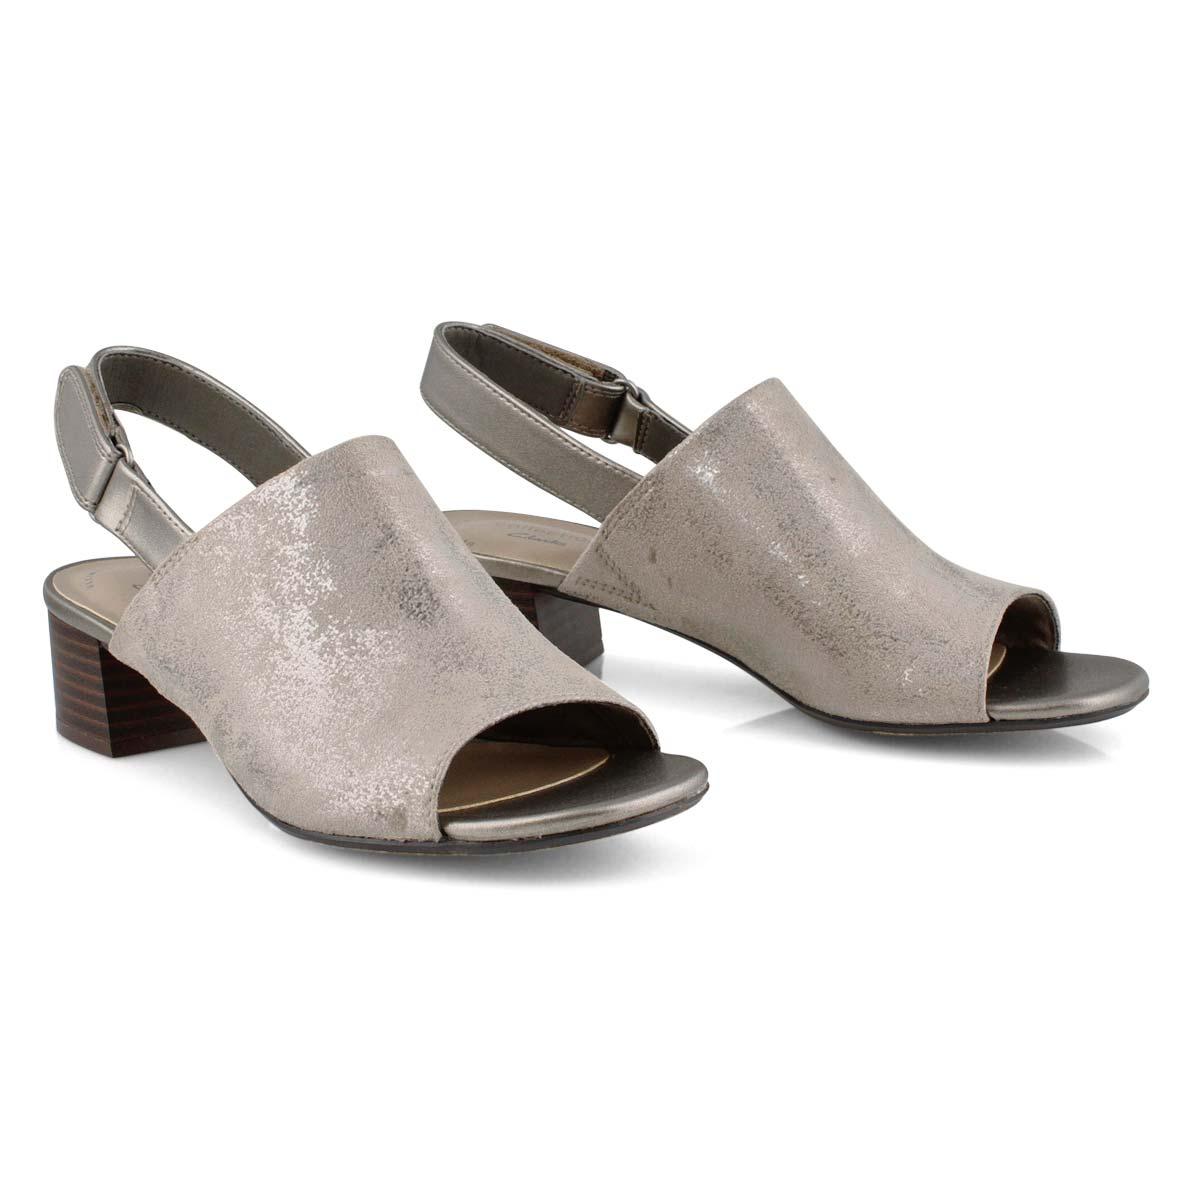 Lds Elisa Lyndsey pewter dress sandal